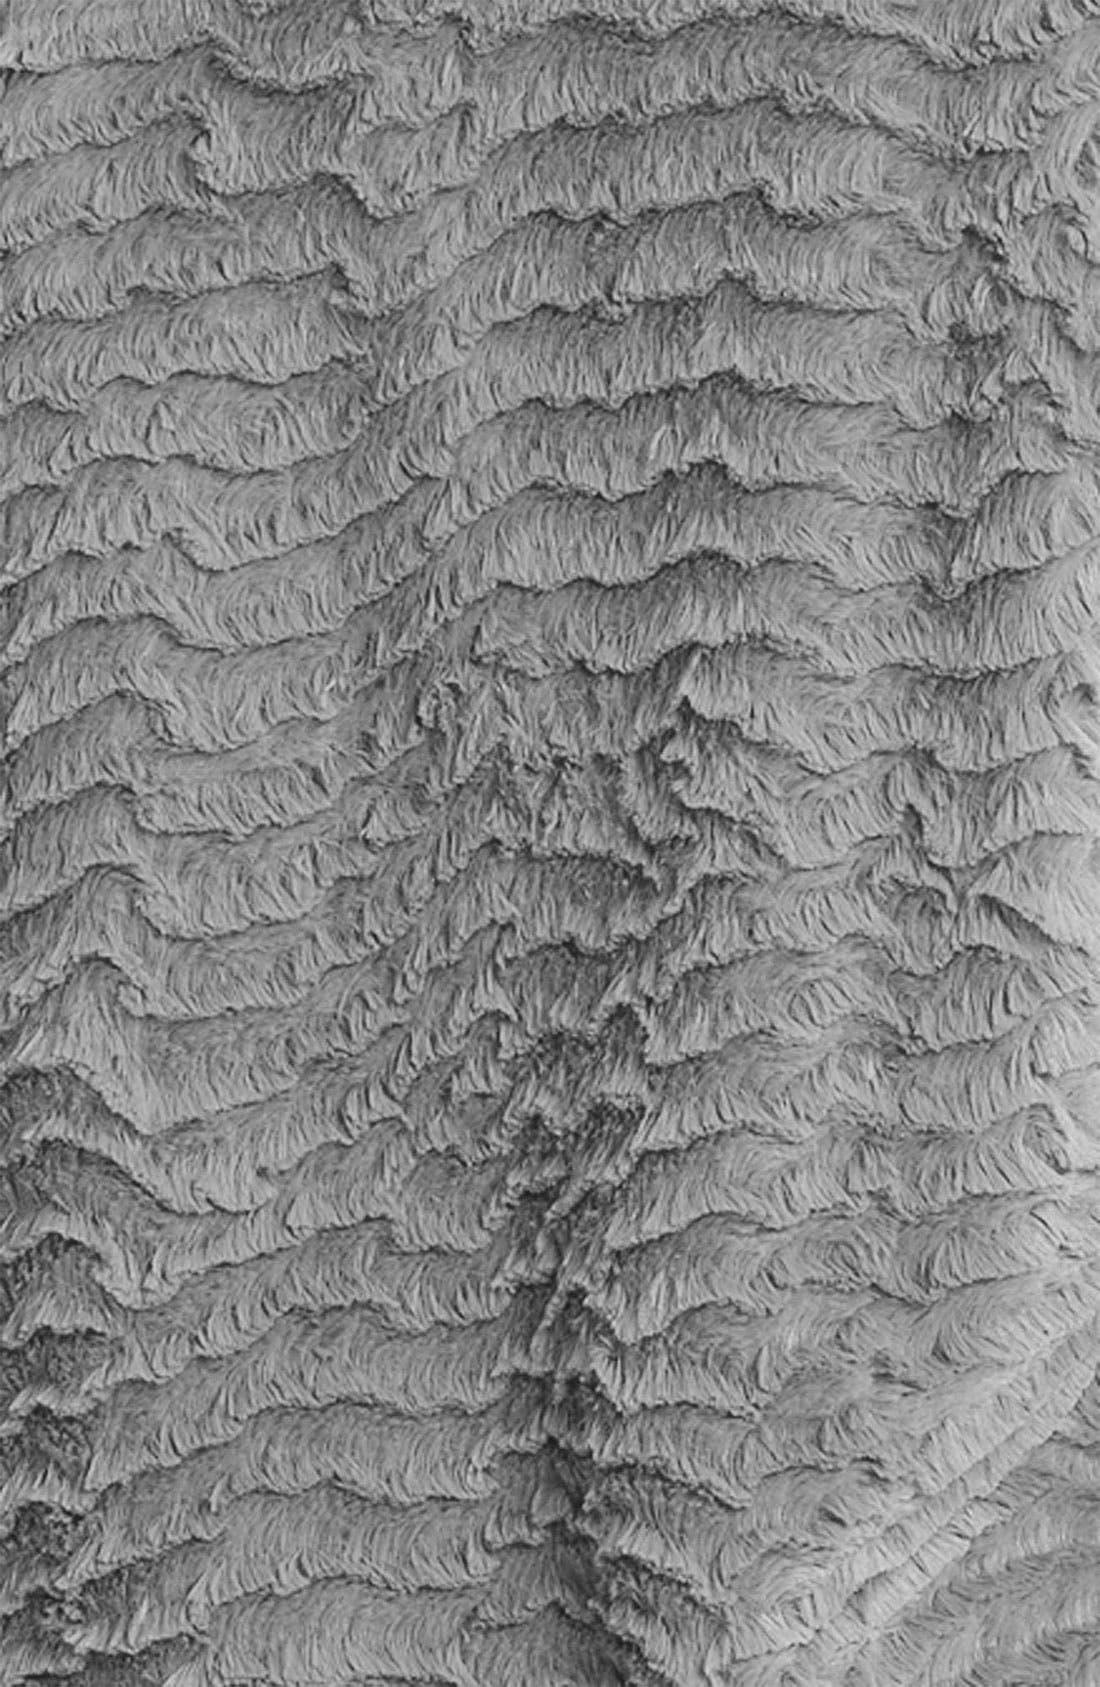 'Pelage' Fleece Jacket,                             Alternate thumbnail 3, color,                             021